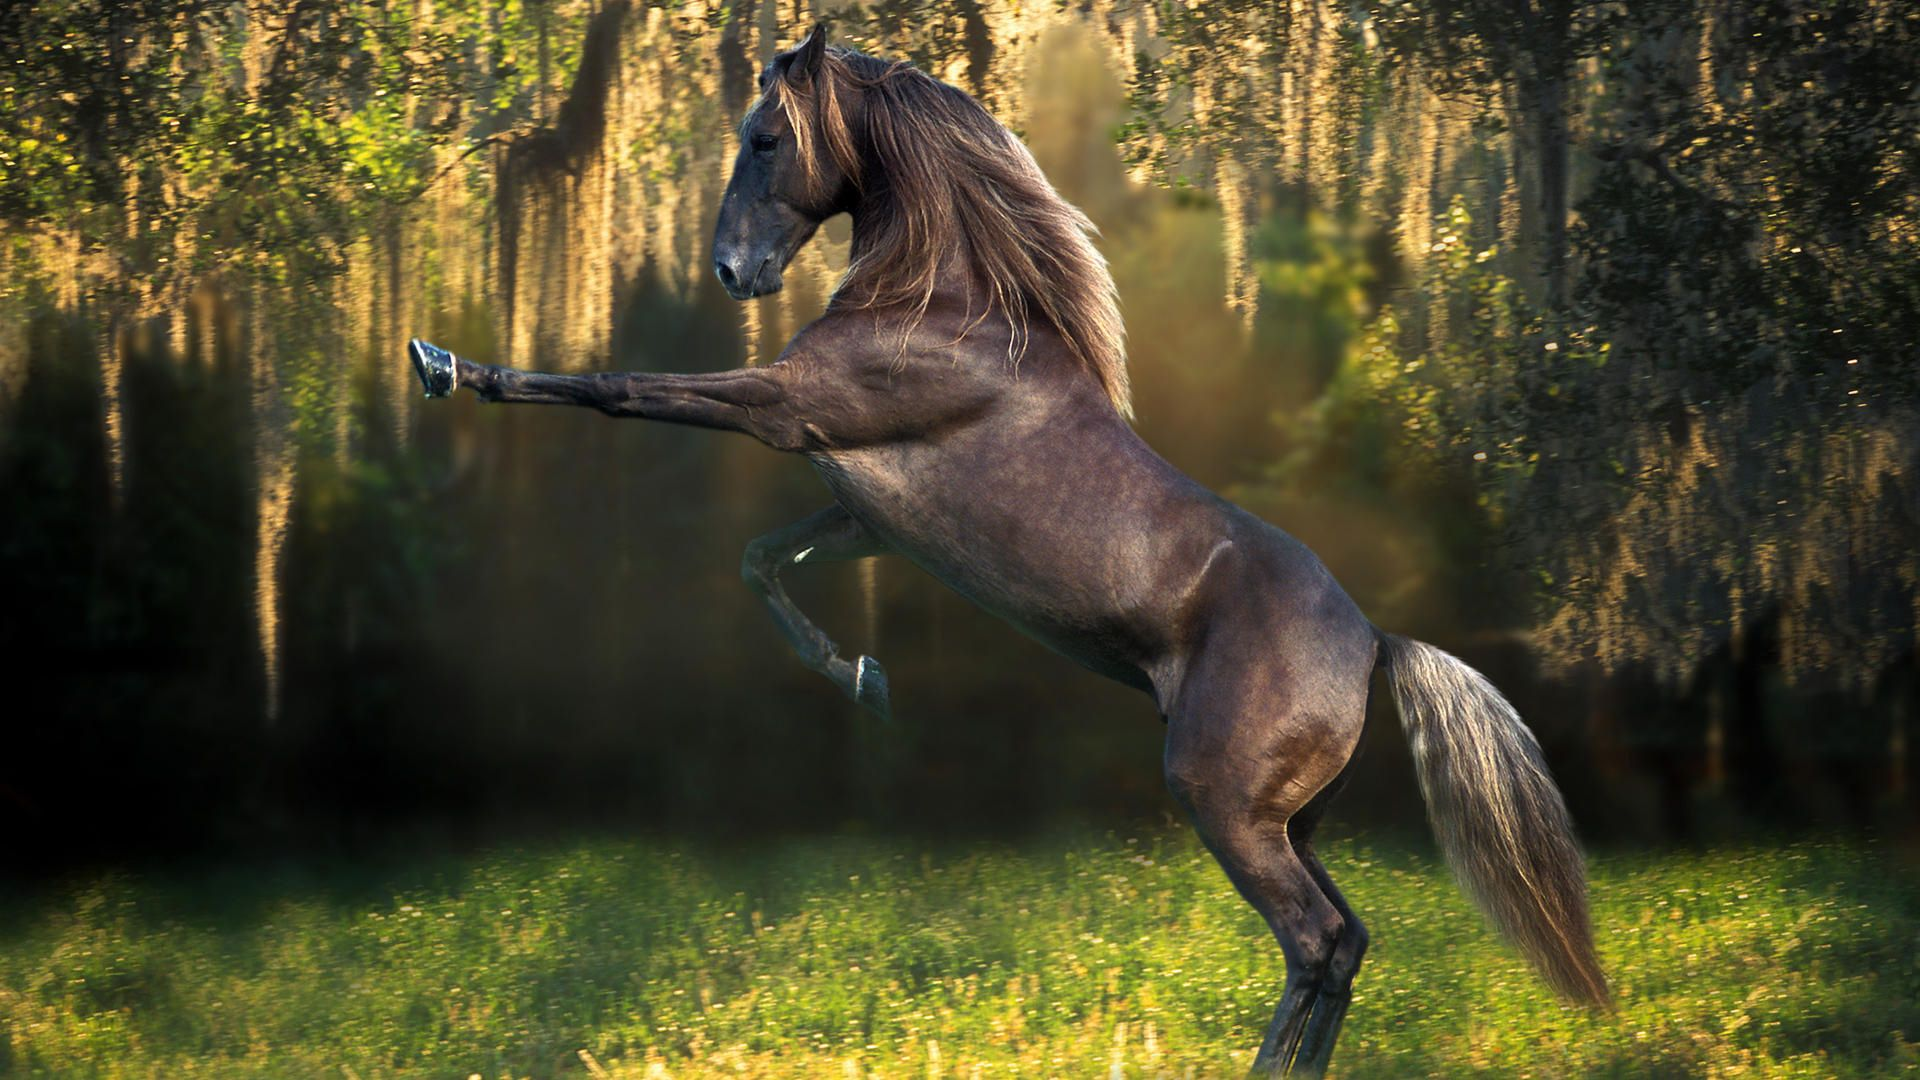 Horse wallpaper download free horse desktop wallpaper - Free horse backgrounds ...